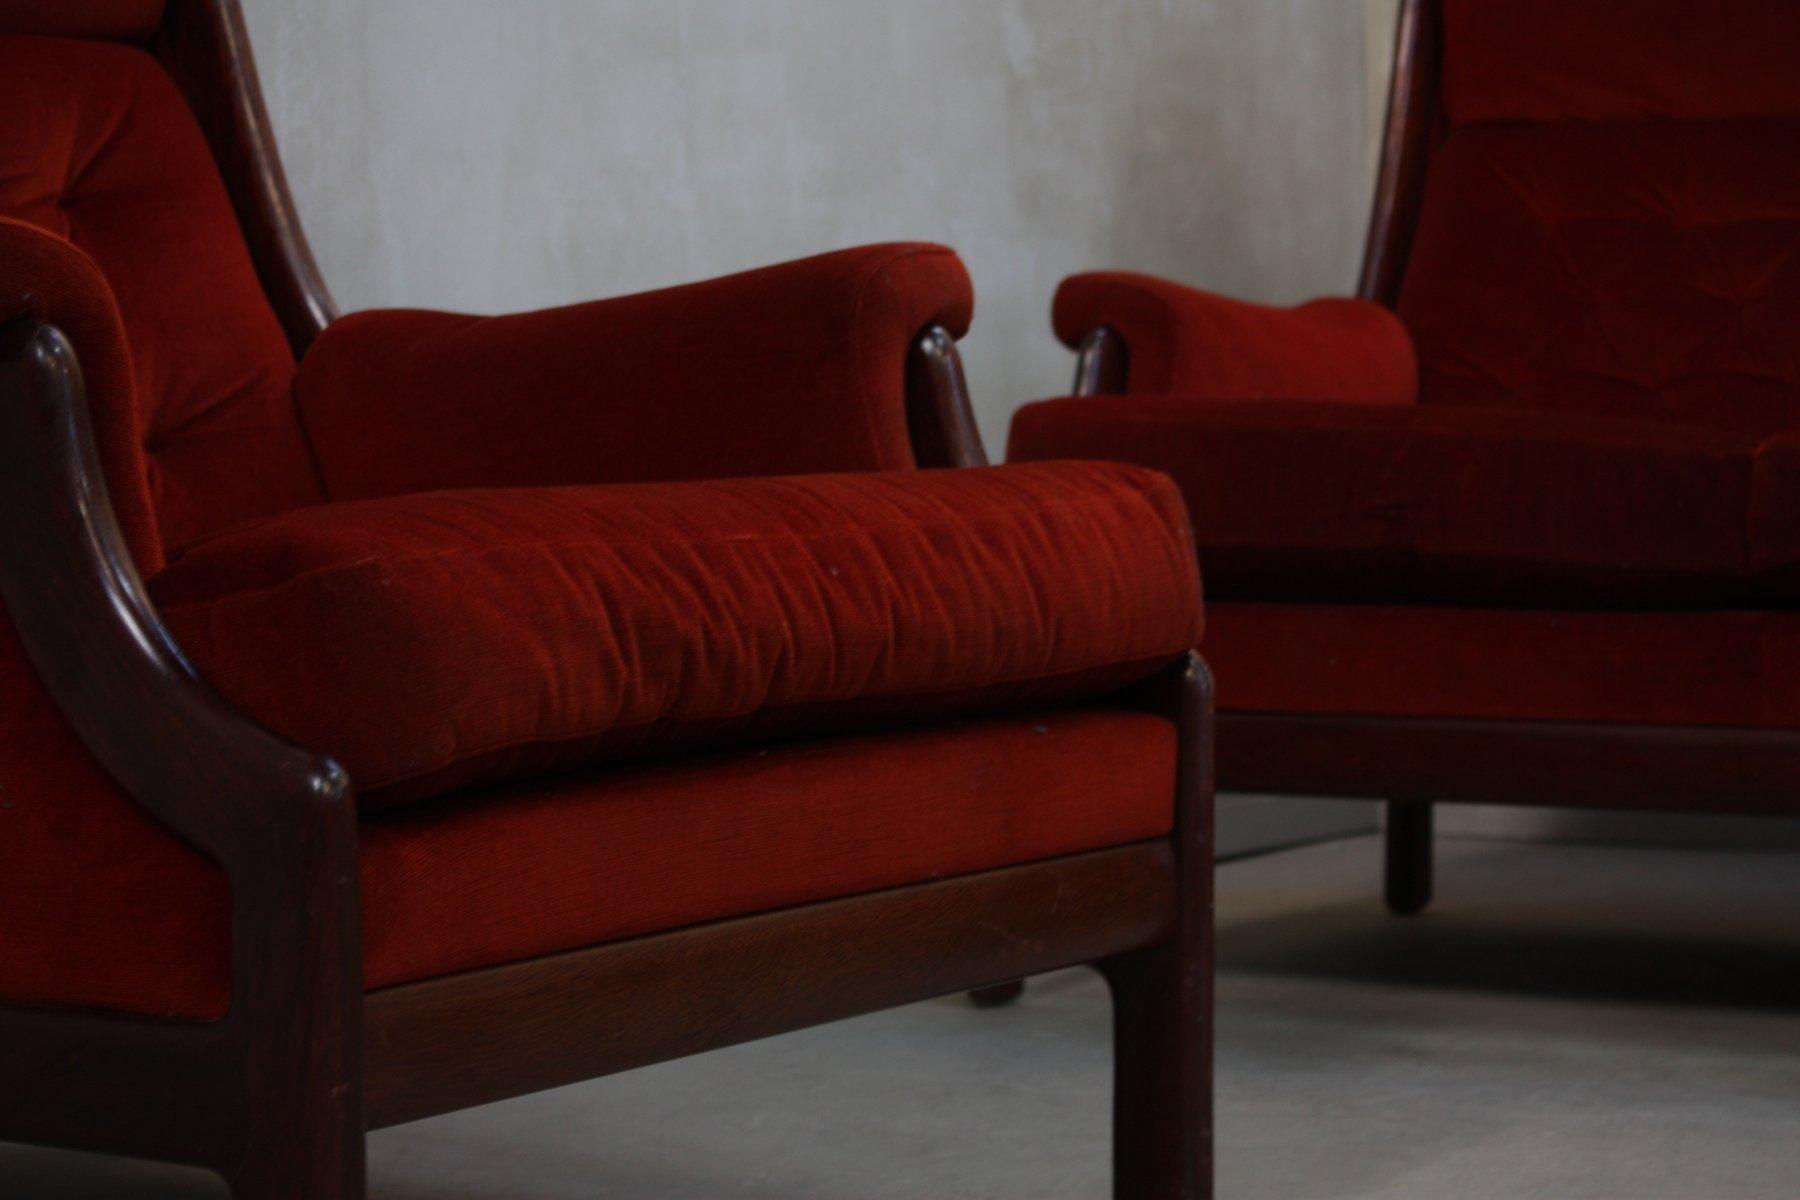 vintage sessel und sofa von guy rogers 1960er 2er set bei pamono kaufen. Black Bedroom Furniture Sets. Home Design Ideas